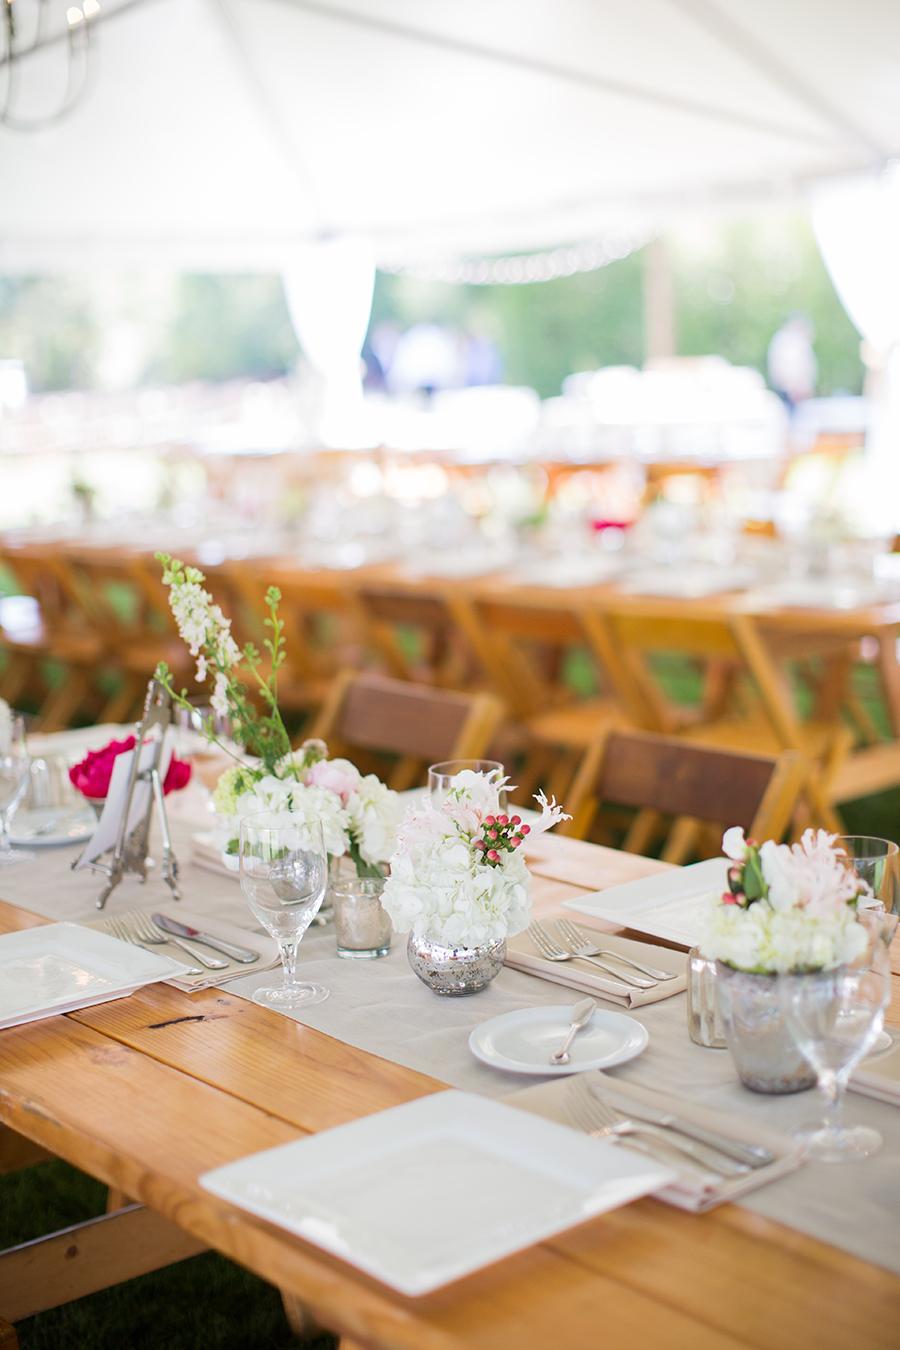 wedding_rentals1.jpg